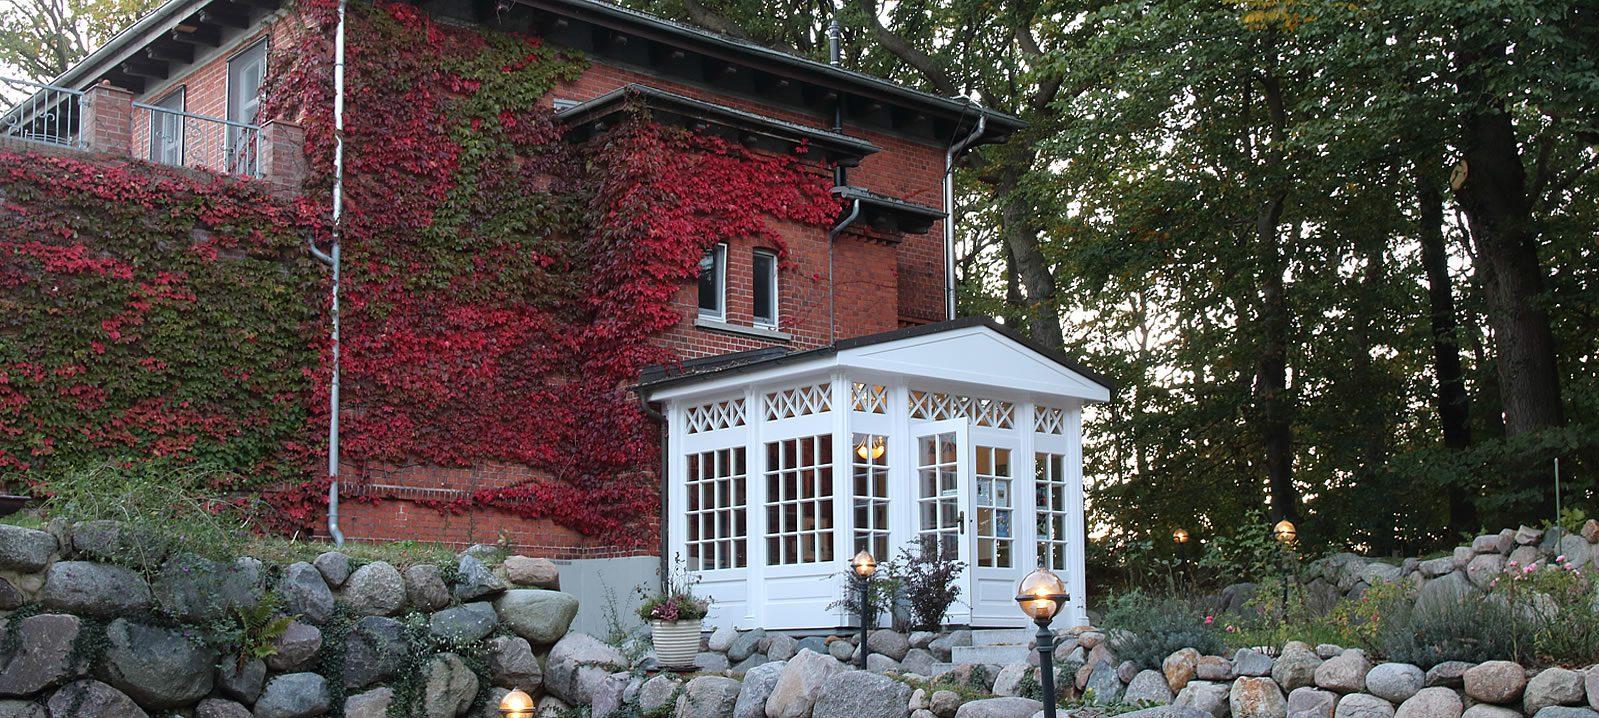 Galerie & Gästehaus Dünenhaus im Herbst, Eingang